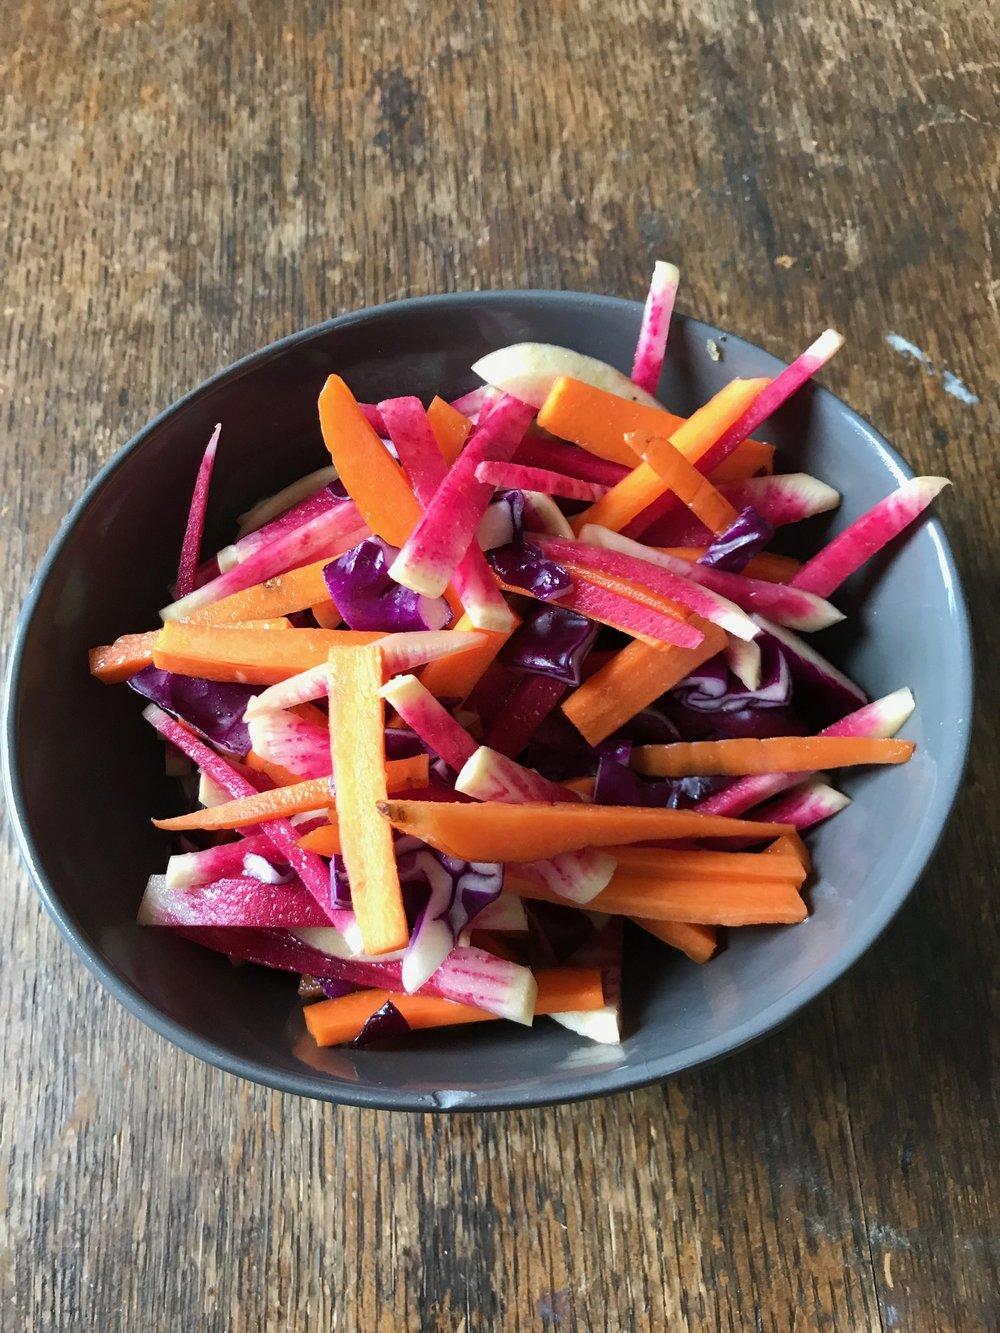 Watermelon Radish, Carrot, and Cabbage Salad